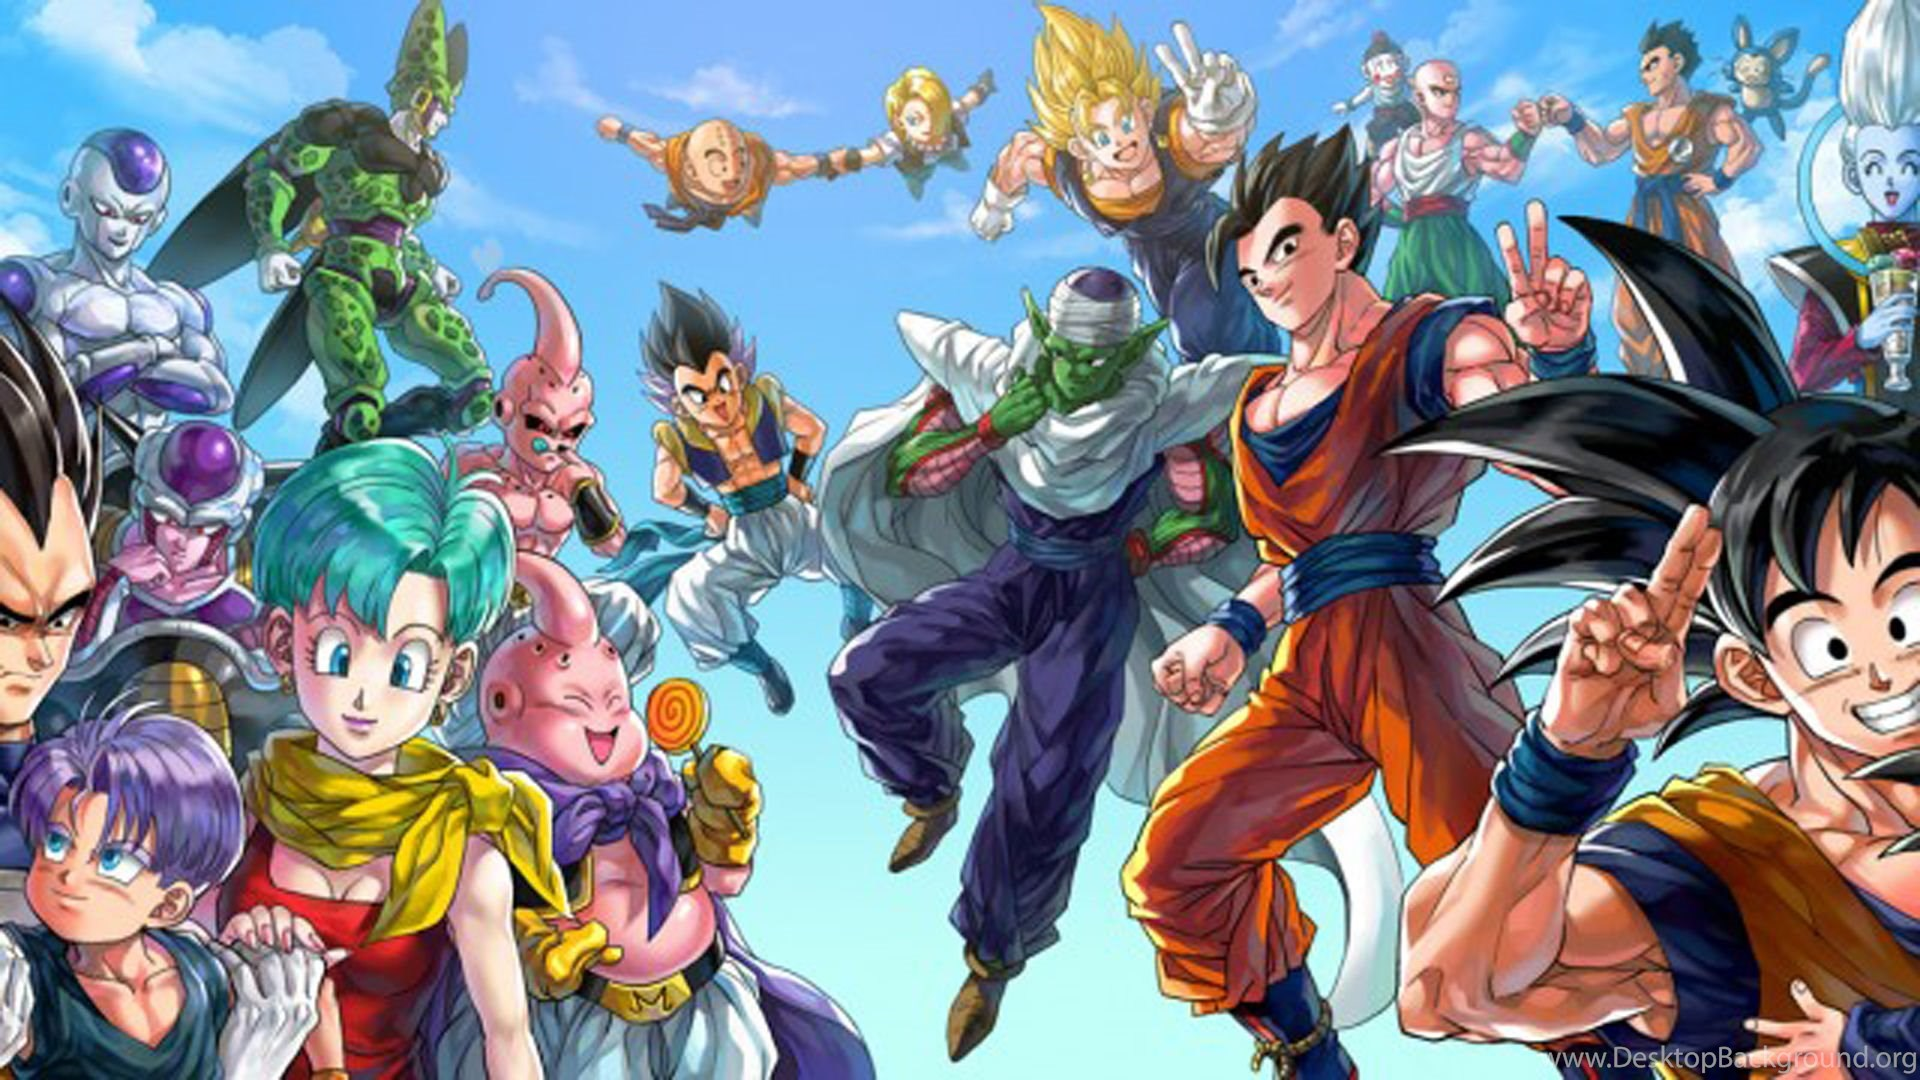 10 quality dragon ball z wallpapers anime manga desktop - Dragon ball z 4 ...